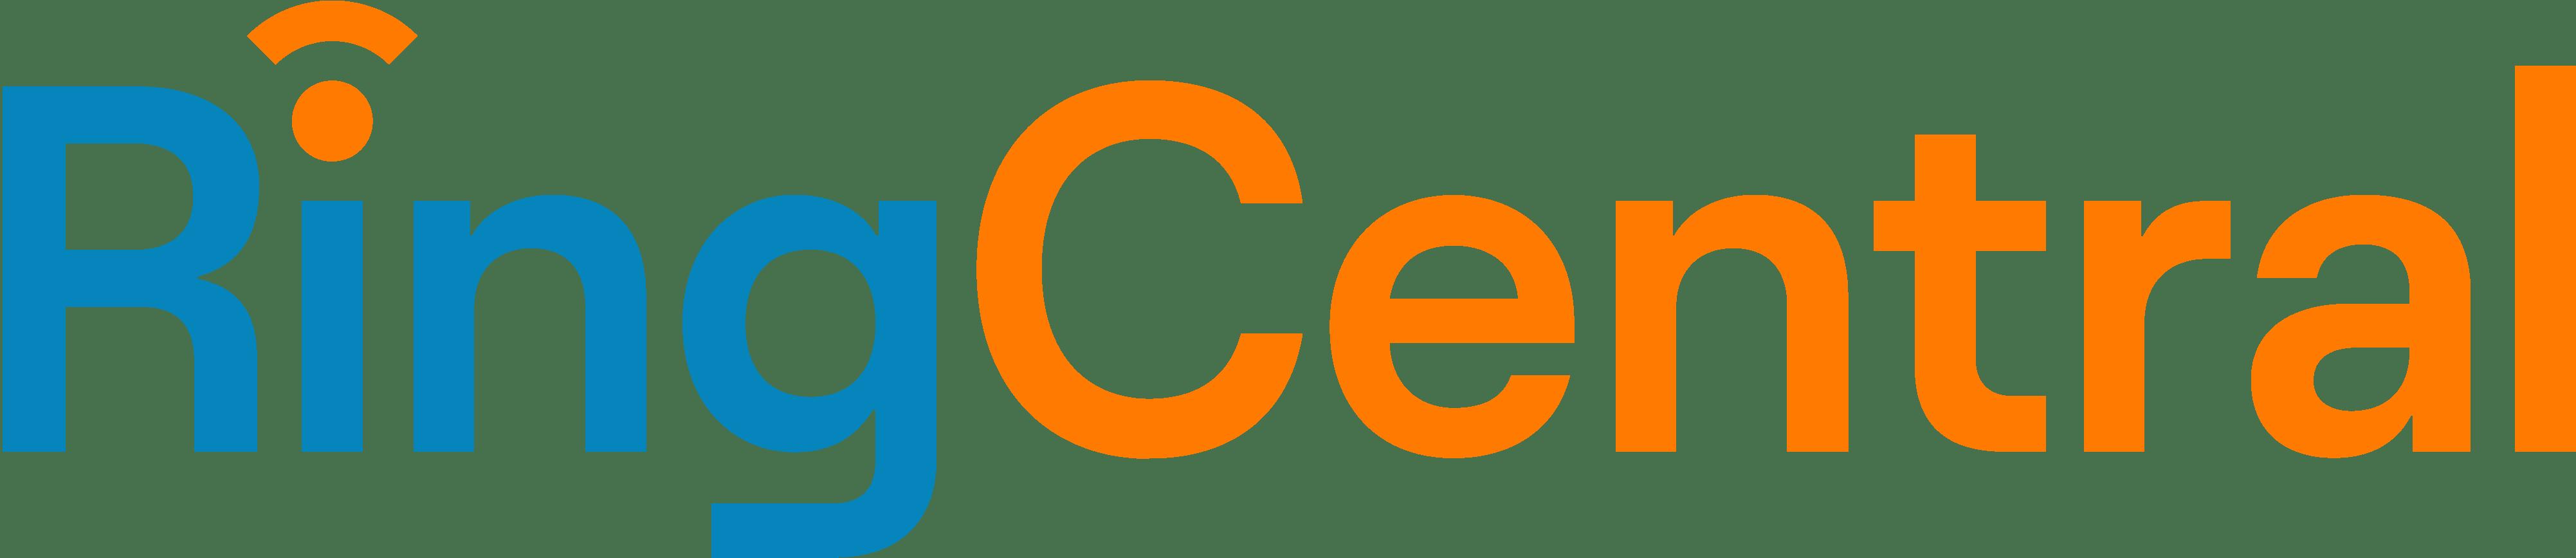 ringcentral_2.0_logo_POS